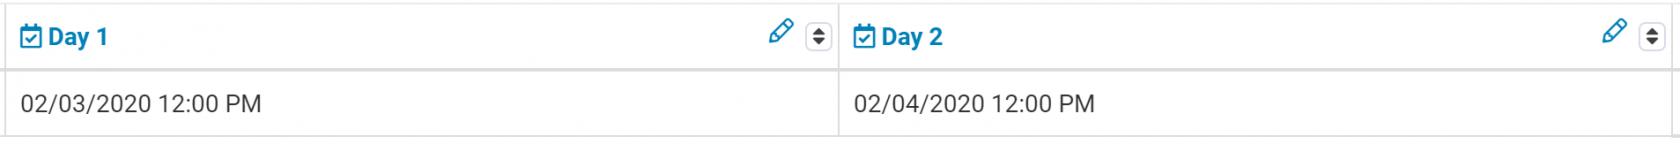 date-formula-2-fields.png